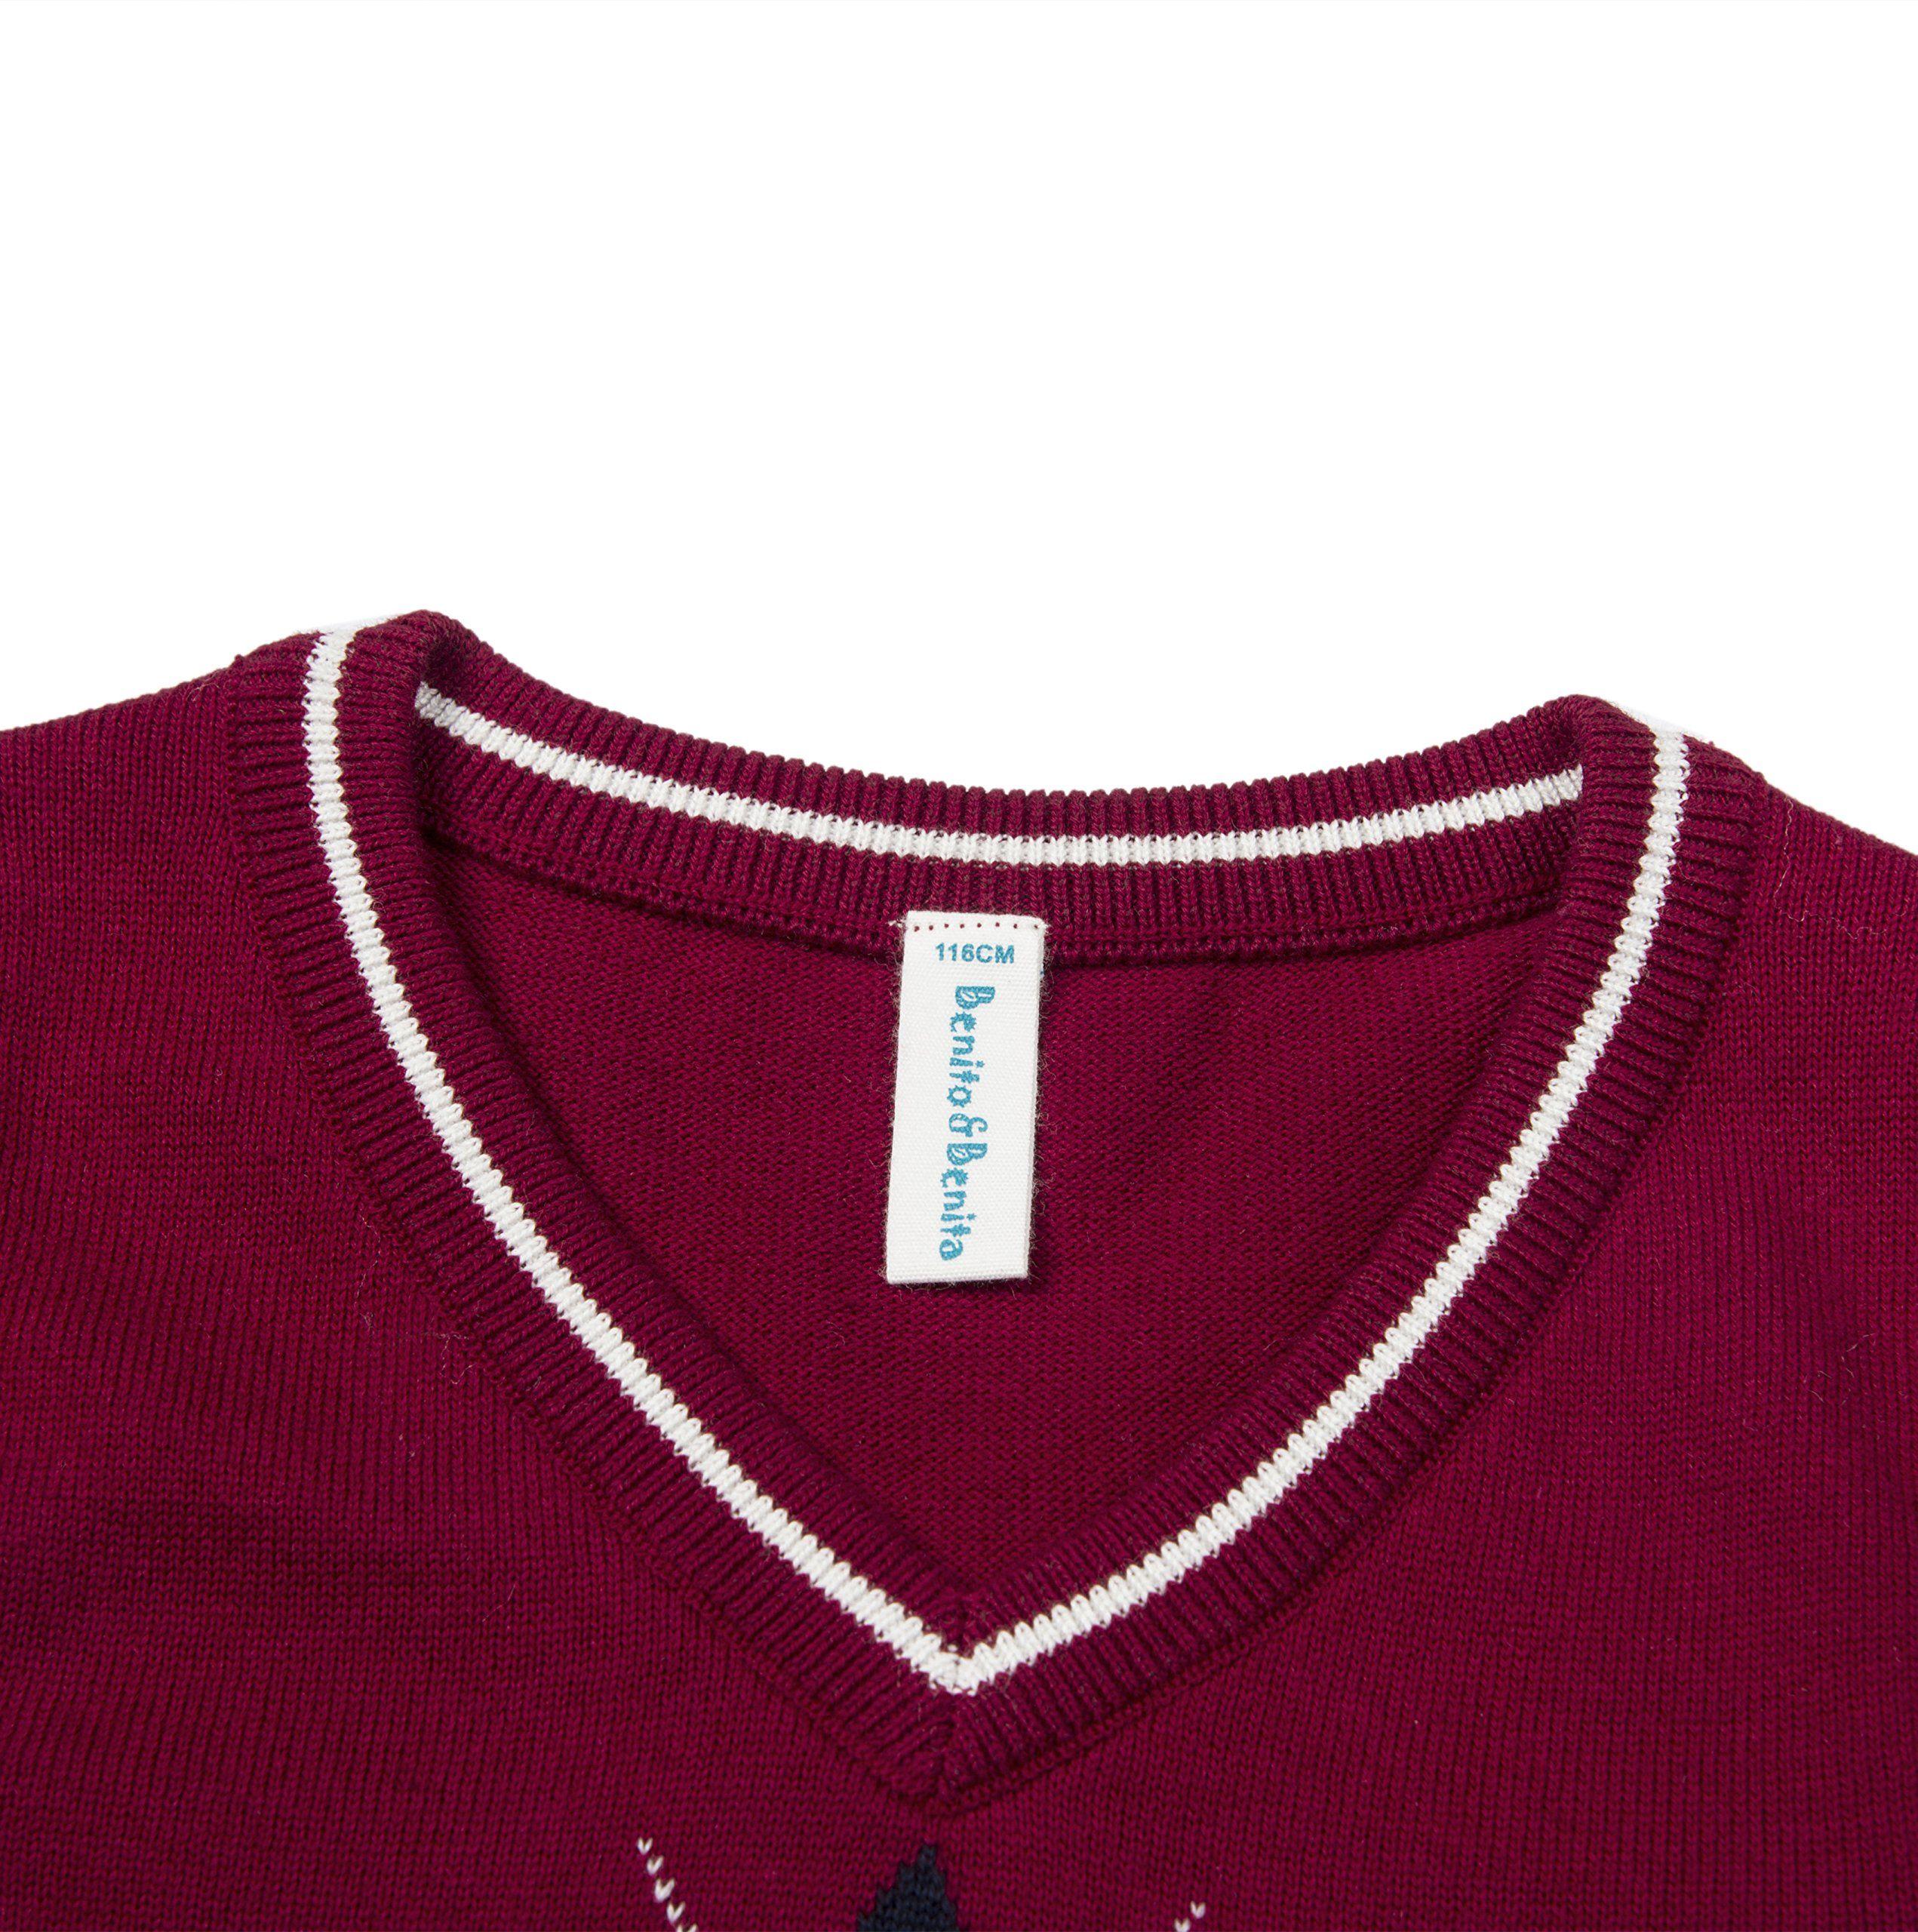 Benito /& Benita Boys Pullover Sweater Uniforms With Argyle Patterns 3-12Y